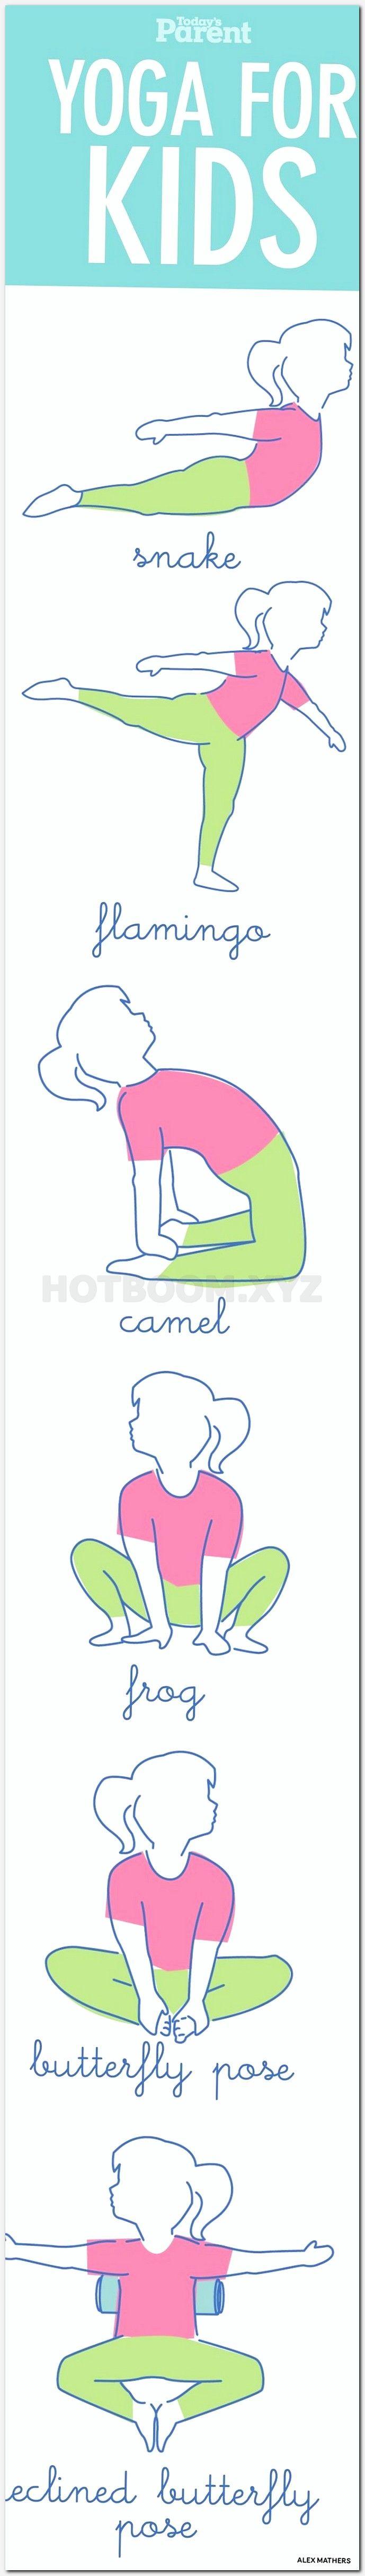 Hatha And Ashtanga Yoga Fast Weight Loss Hypnosis Ramdev Baba Diet